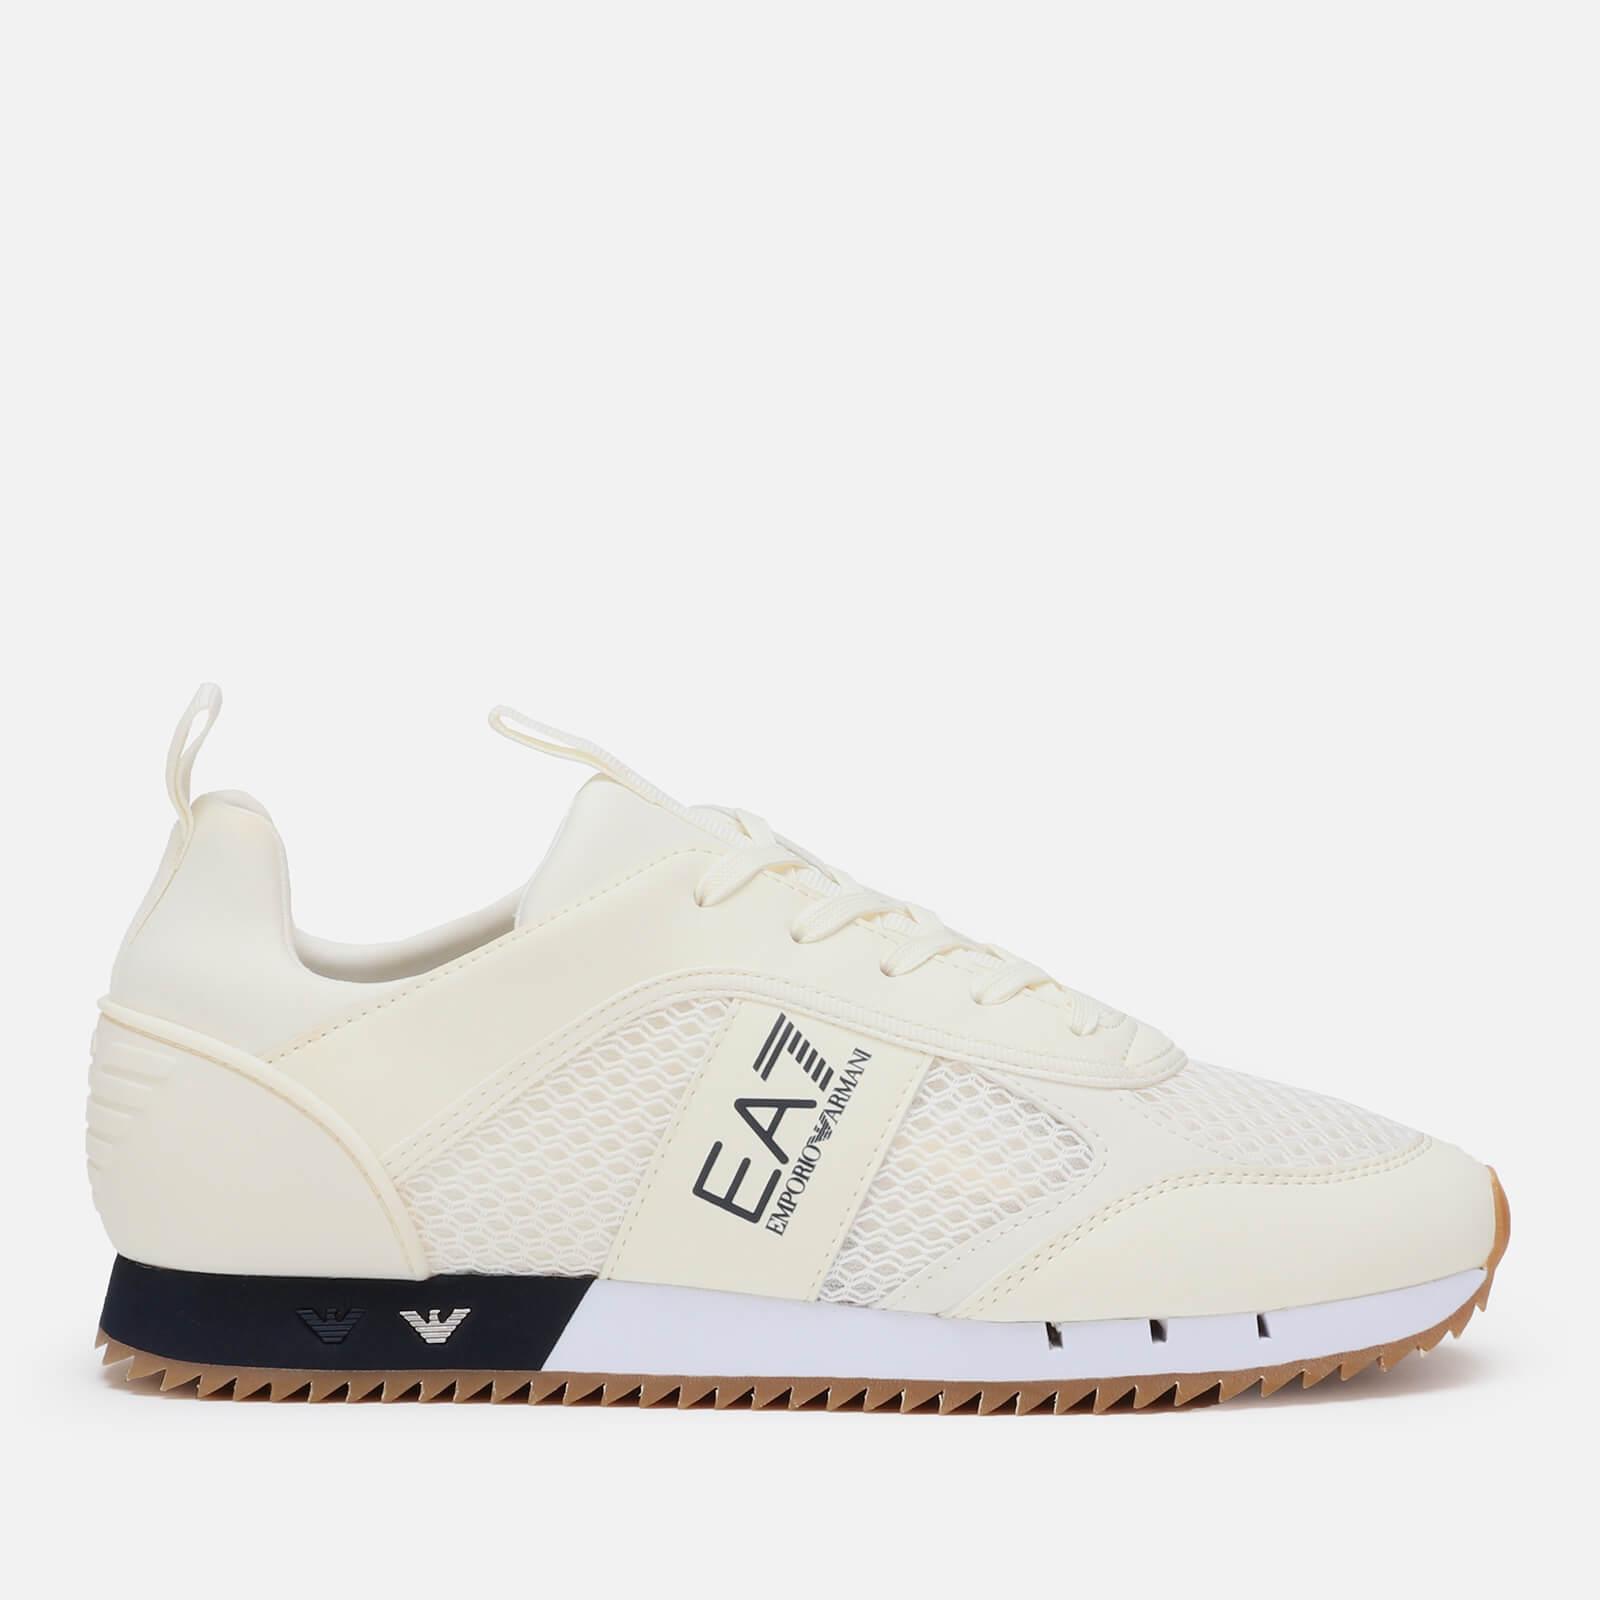 274a97723 Emporio Armani EA7 Men's Black and White Laces Trainers - White Mens  Footwear | TheHut.com